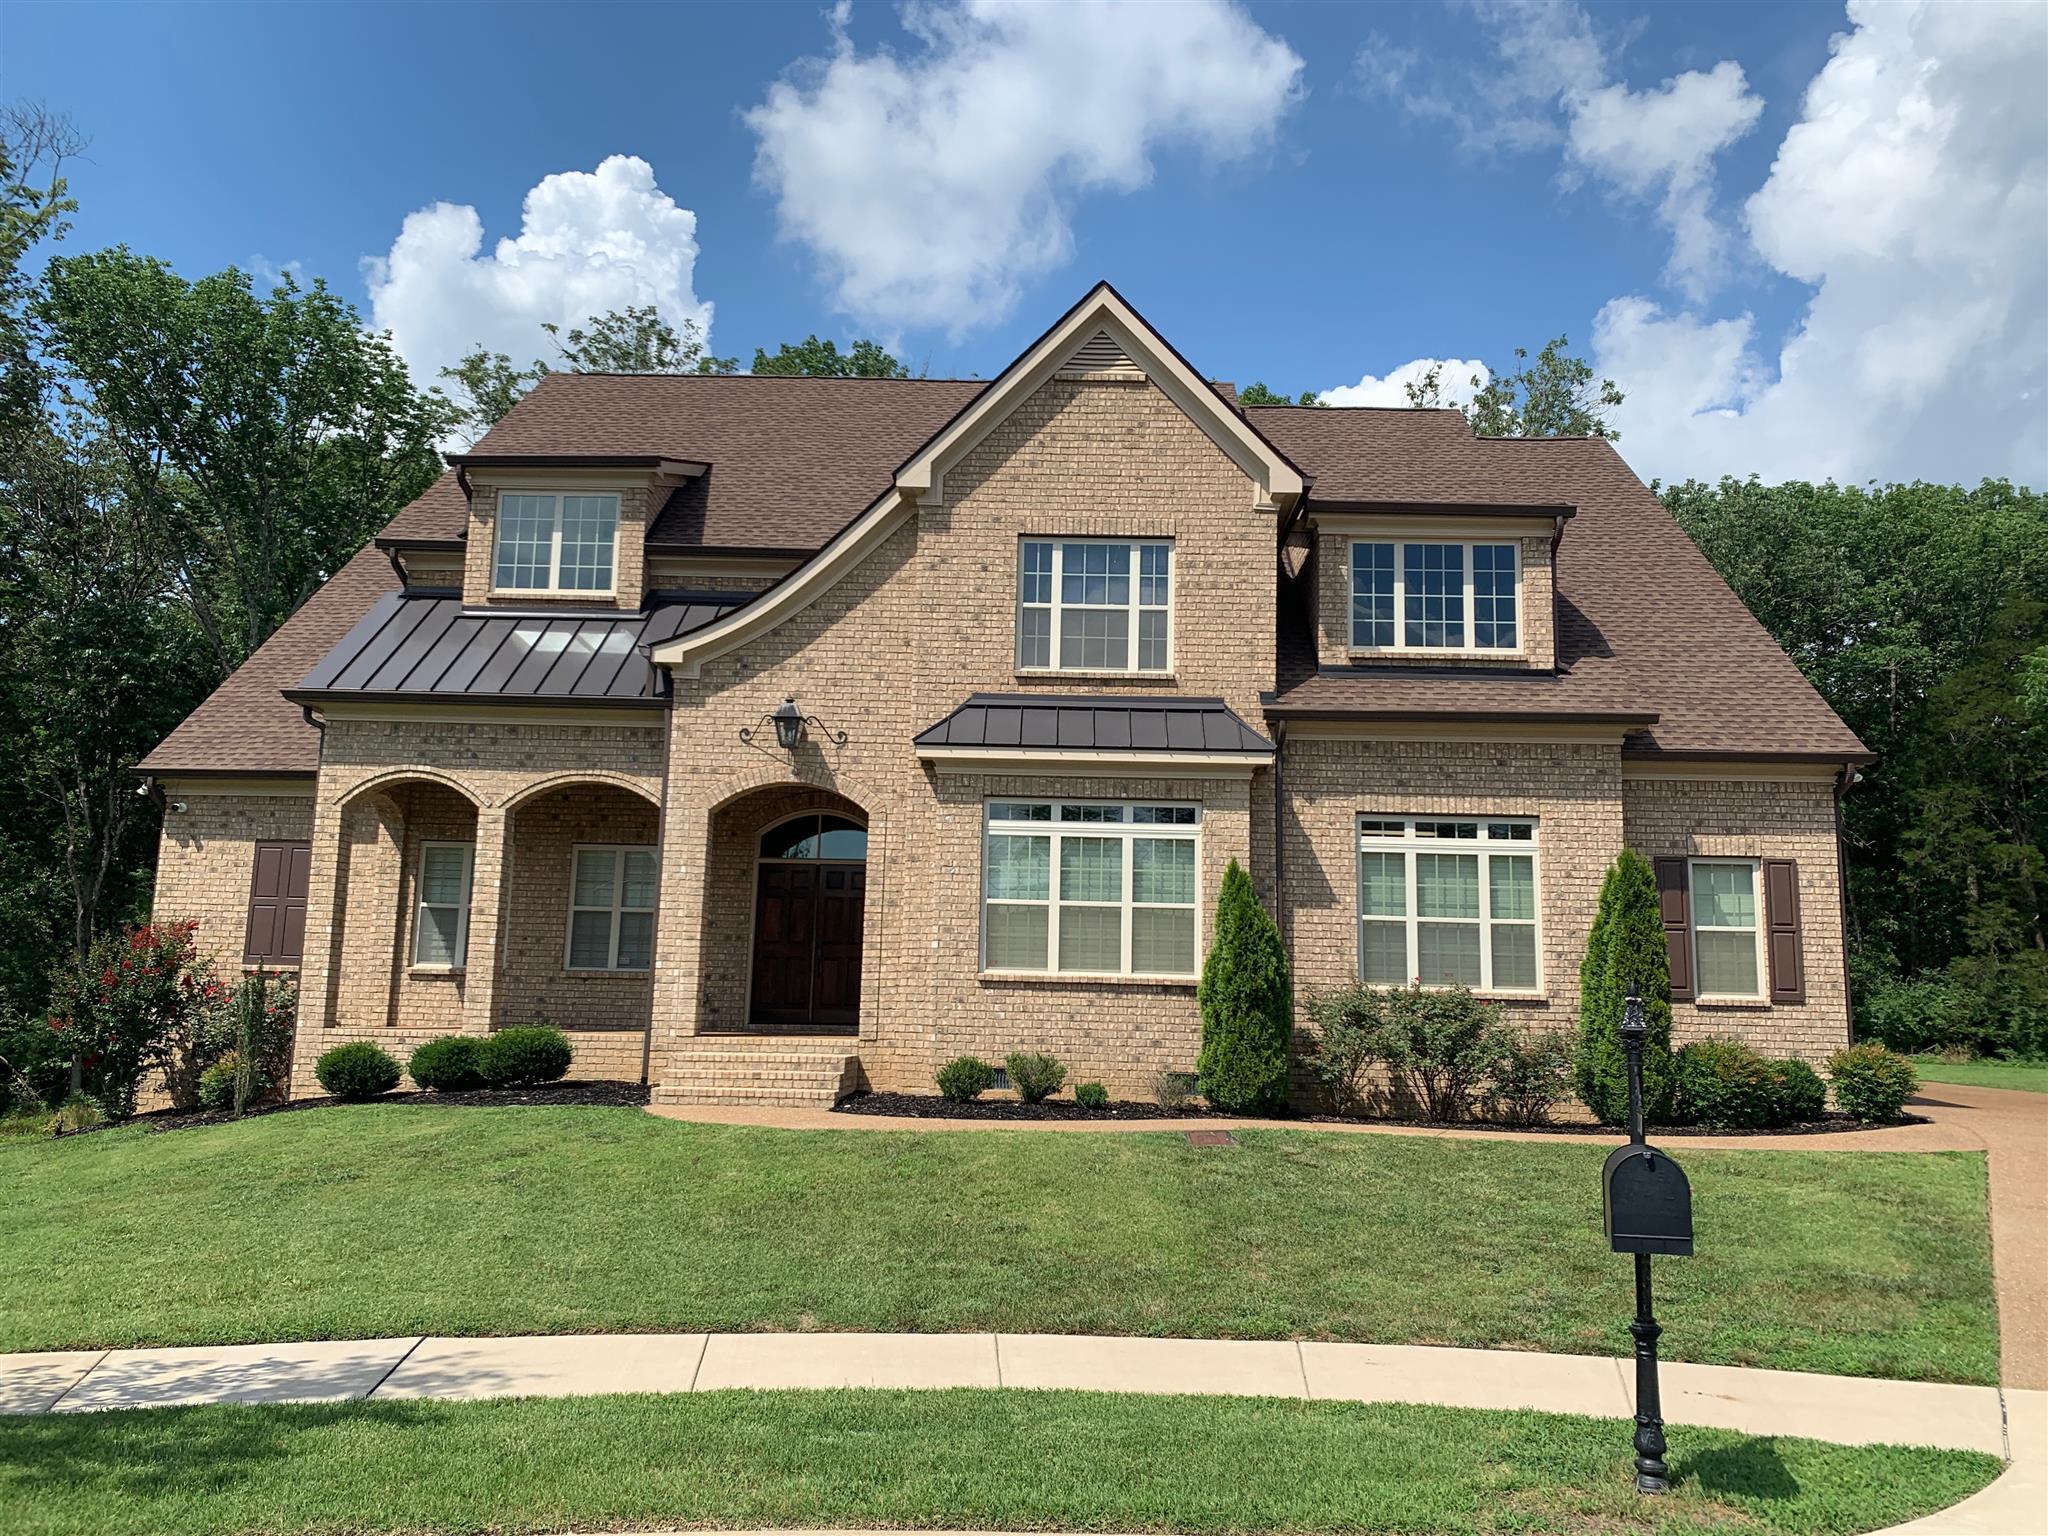 2235 Dunblane Ln, Franklin, TN 37069 - Franklin, TN real estate listing